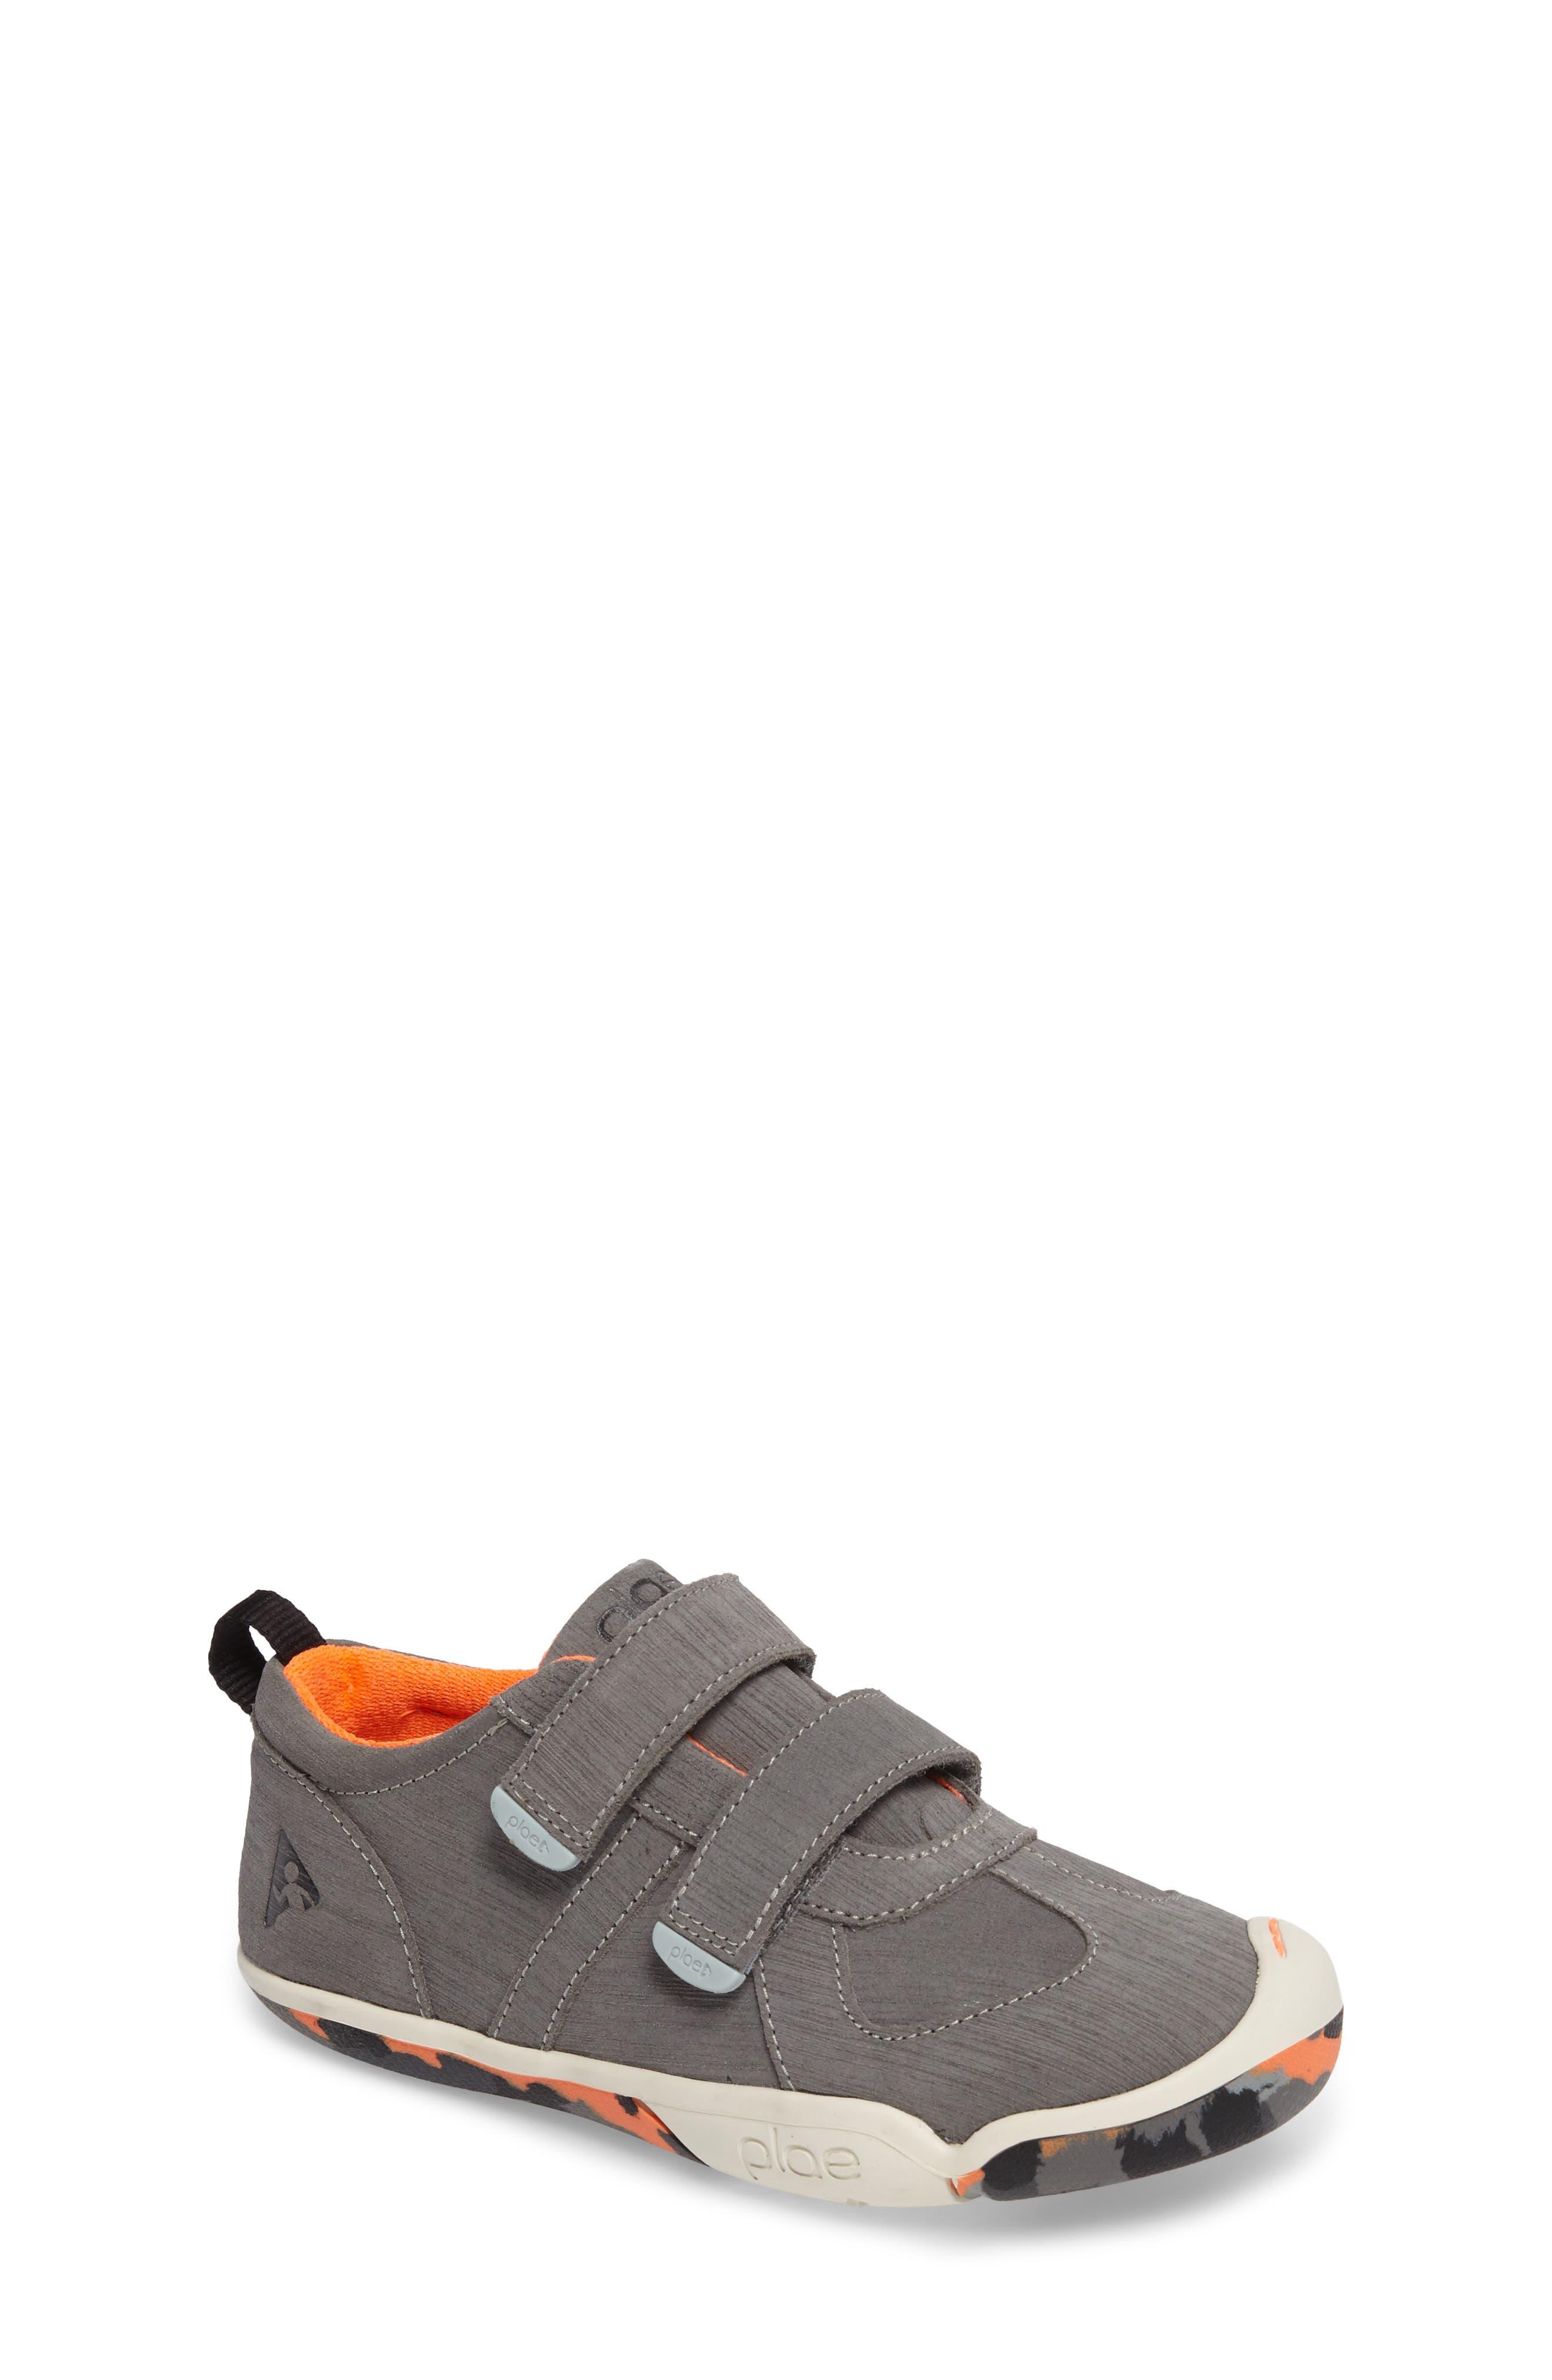 PLAE'Nat' Customizable Sneaker(Walker, Toddler, Little Kid & Big Kid)